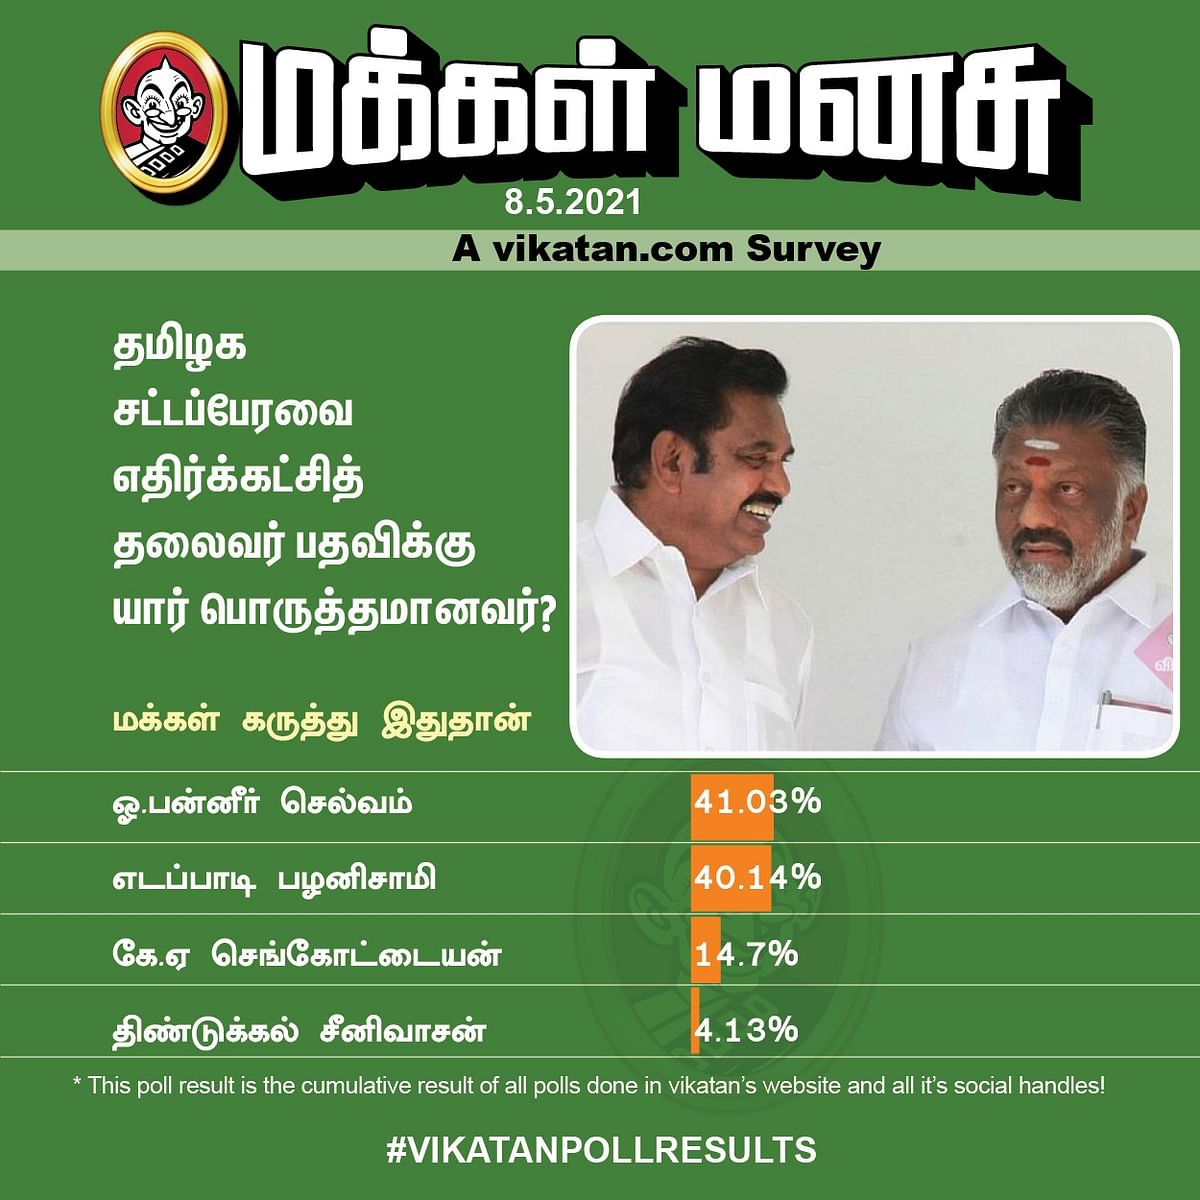 ADMK | Vikatan Poll Results